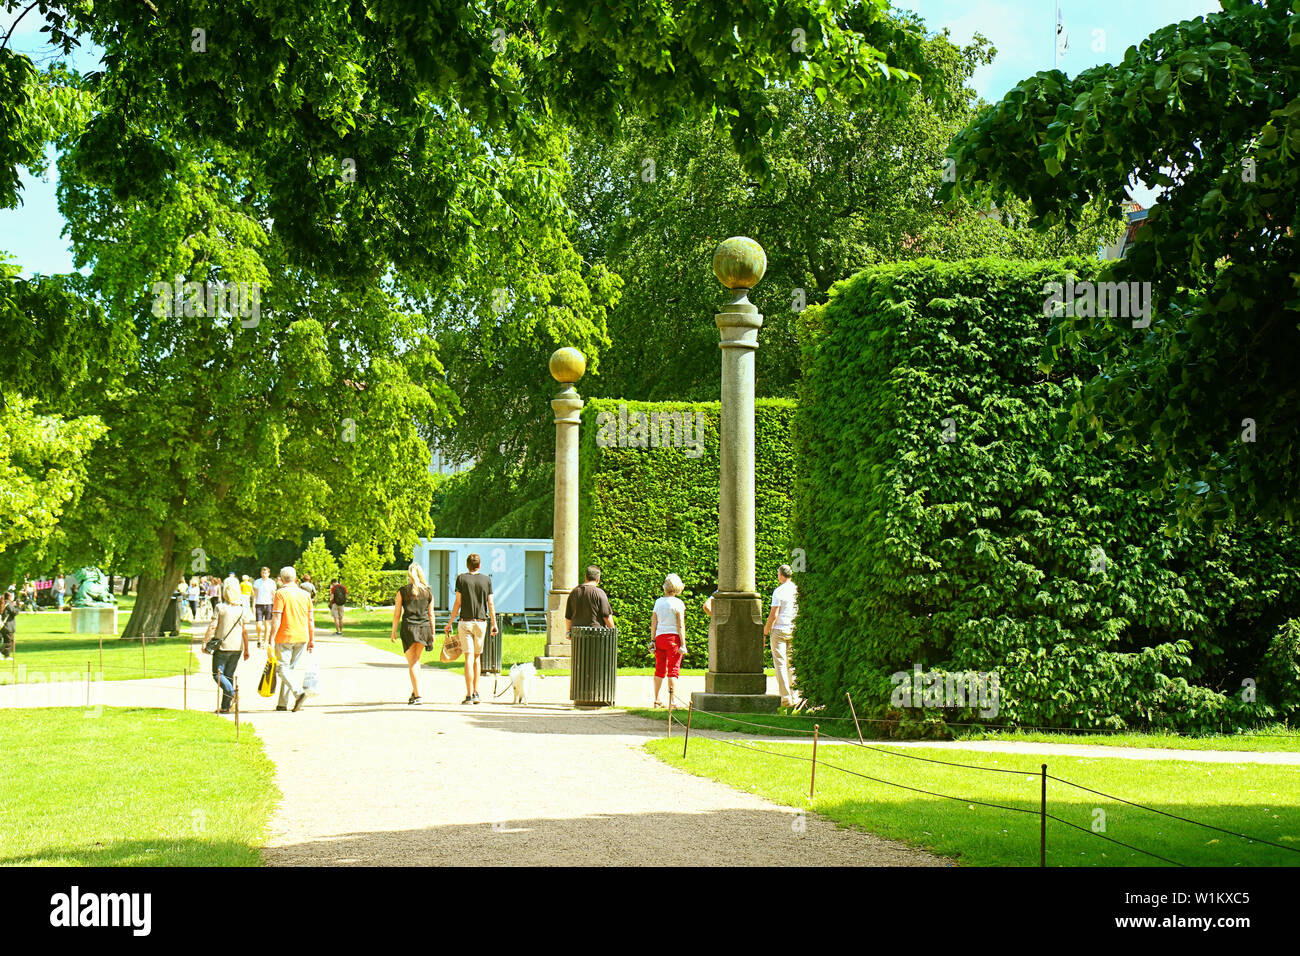 COPENHAGEN, DENMARK - JUNE 16, 2019 Beautiful summer view of the king's garden near Rosenborg castle in central Copenhagen established since early 17t Stock Photo